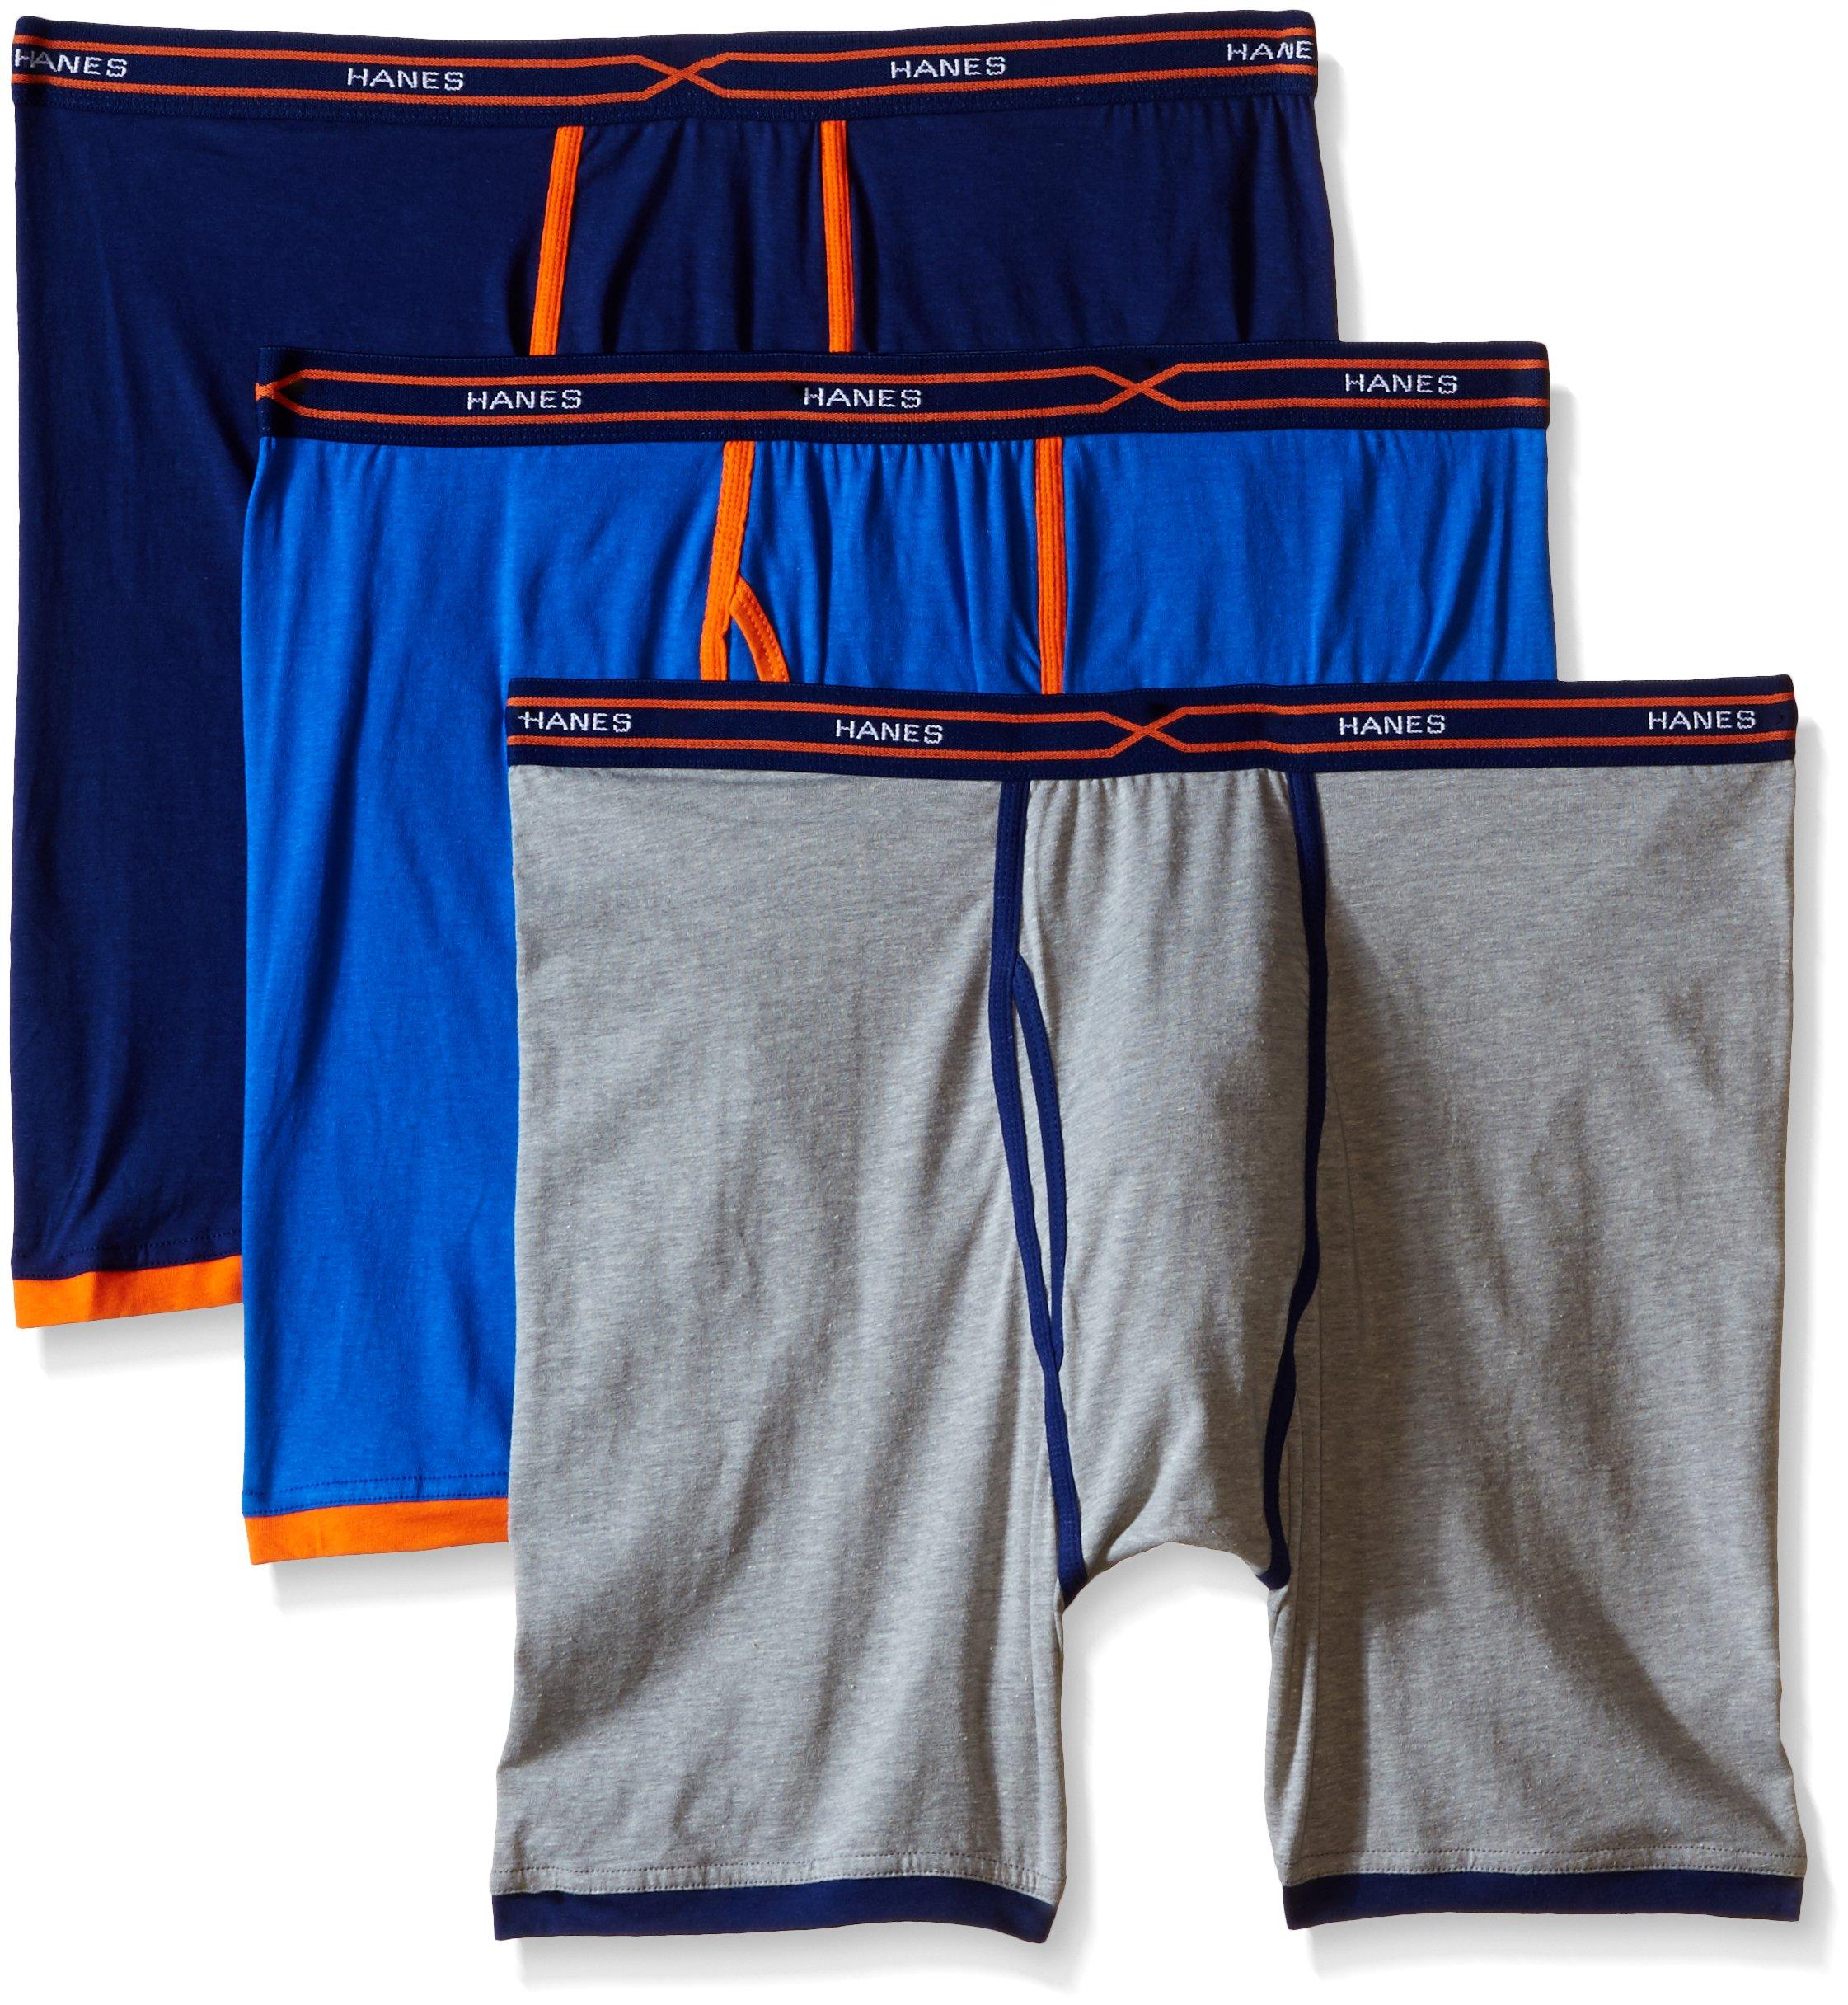 Hanes Men's 3-Pack X-Temp Active Cool Long Leg Boxer Brief, Assorted, Medium